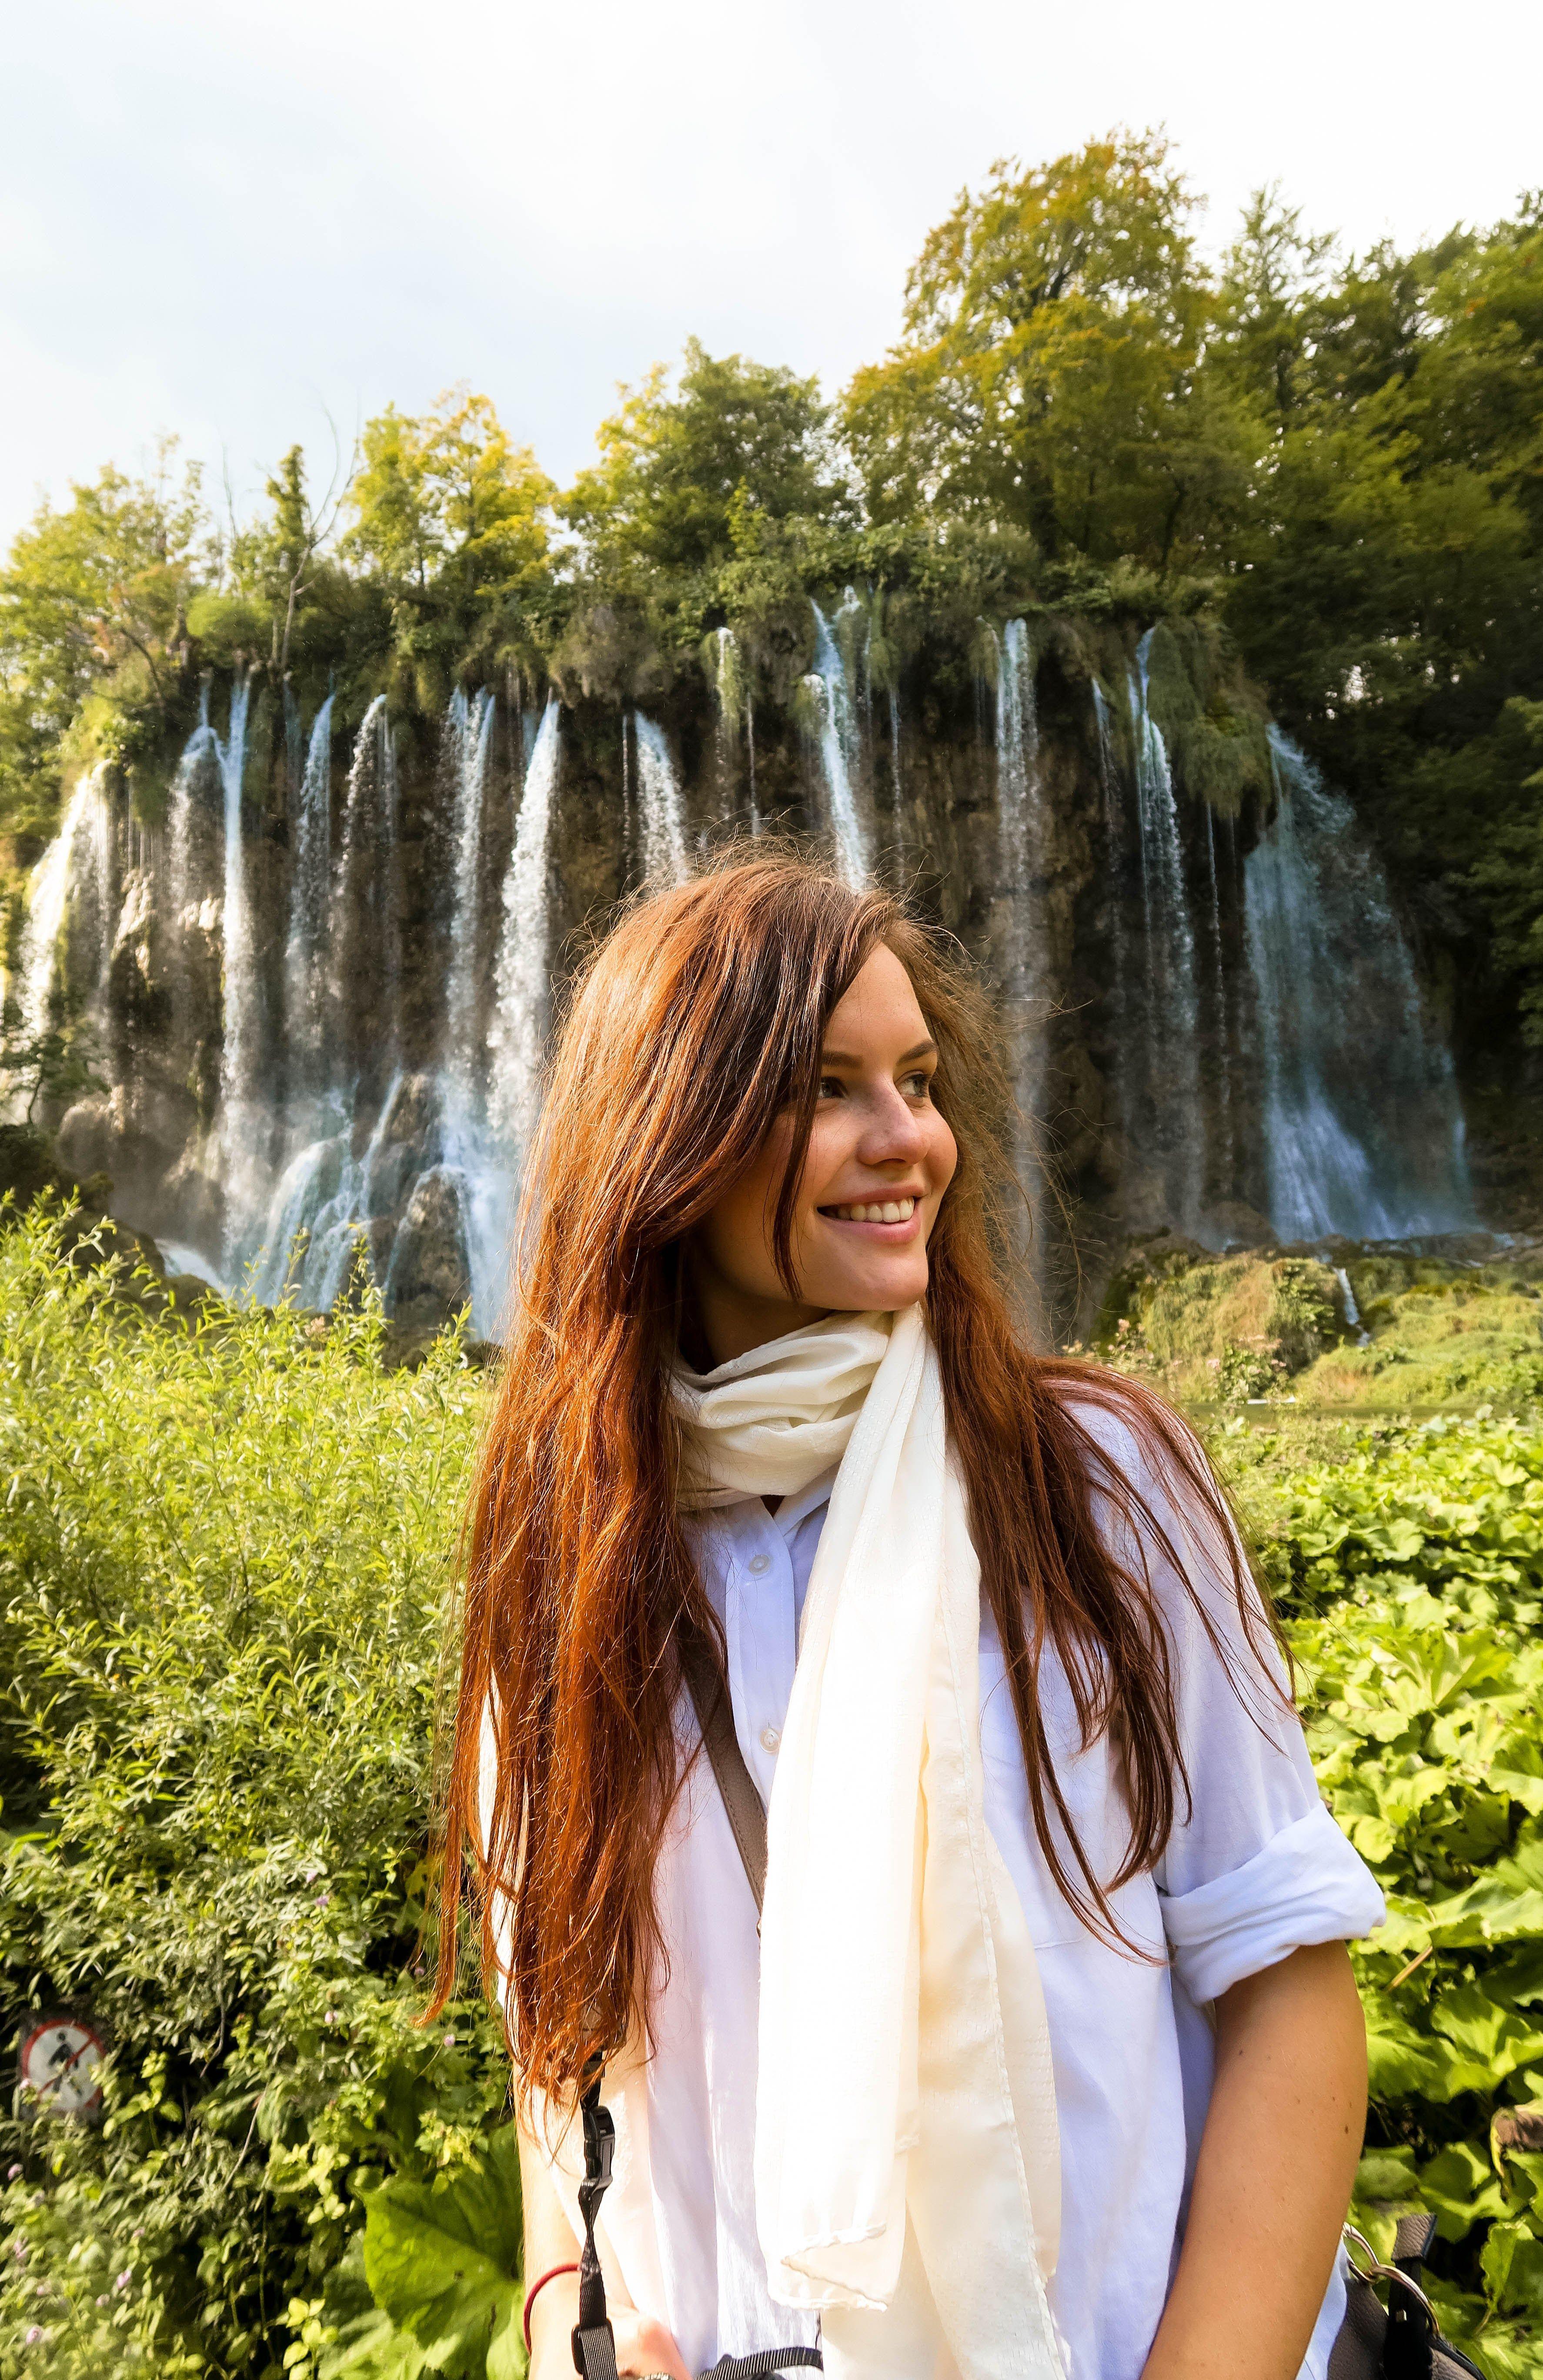 Plitvice Lakes National Park Travel Blogger Solo Trip To Zagreb Croatia Plitvice Daytrip From Zagreb Solo Travel National Parks Trip Meet Local Women